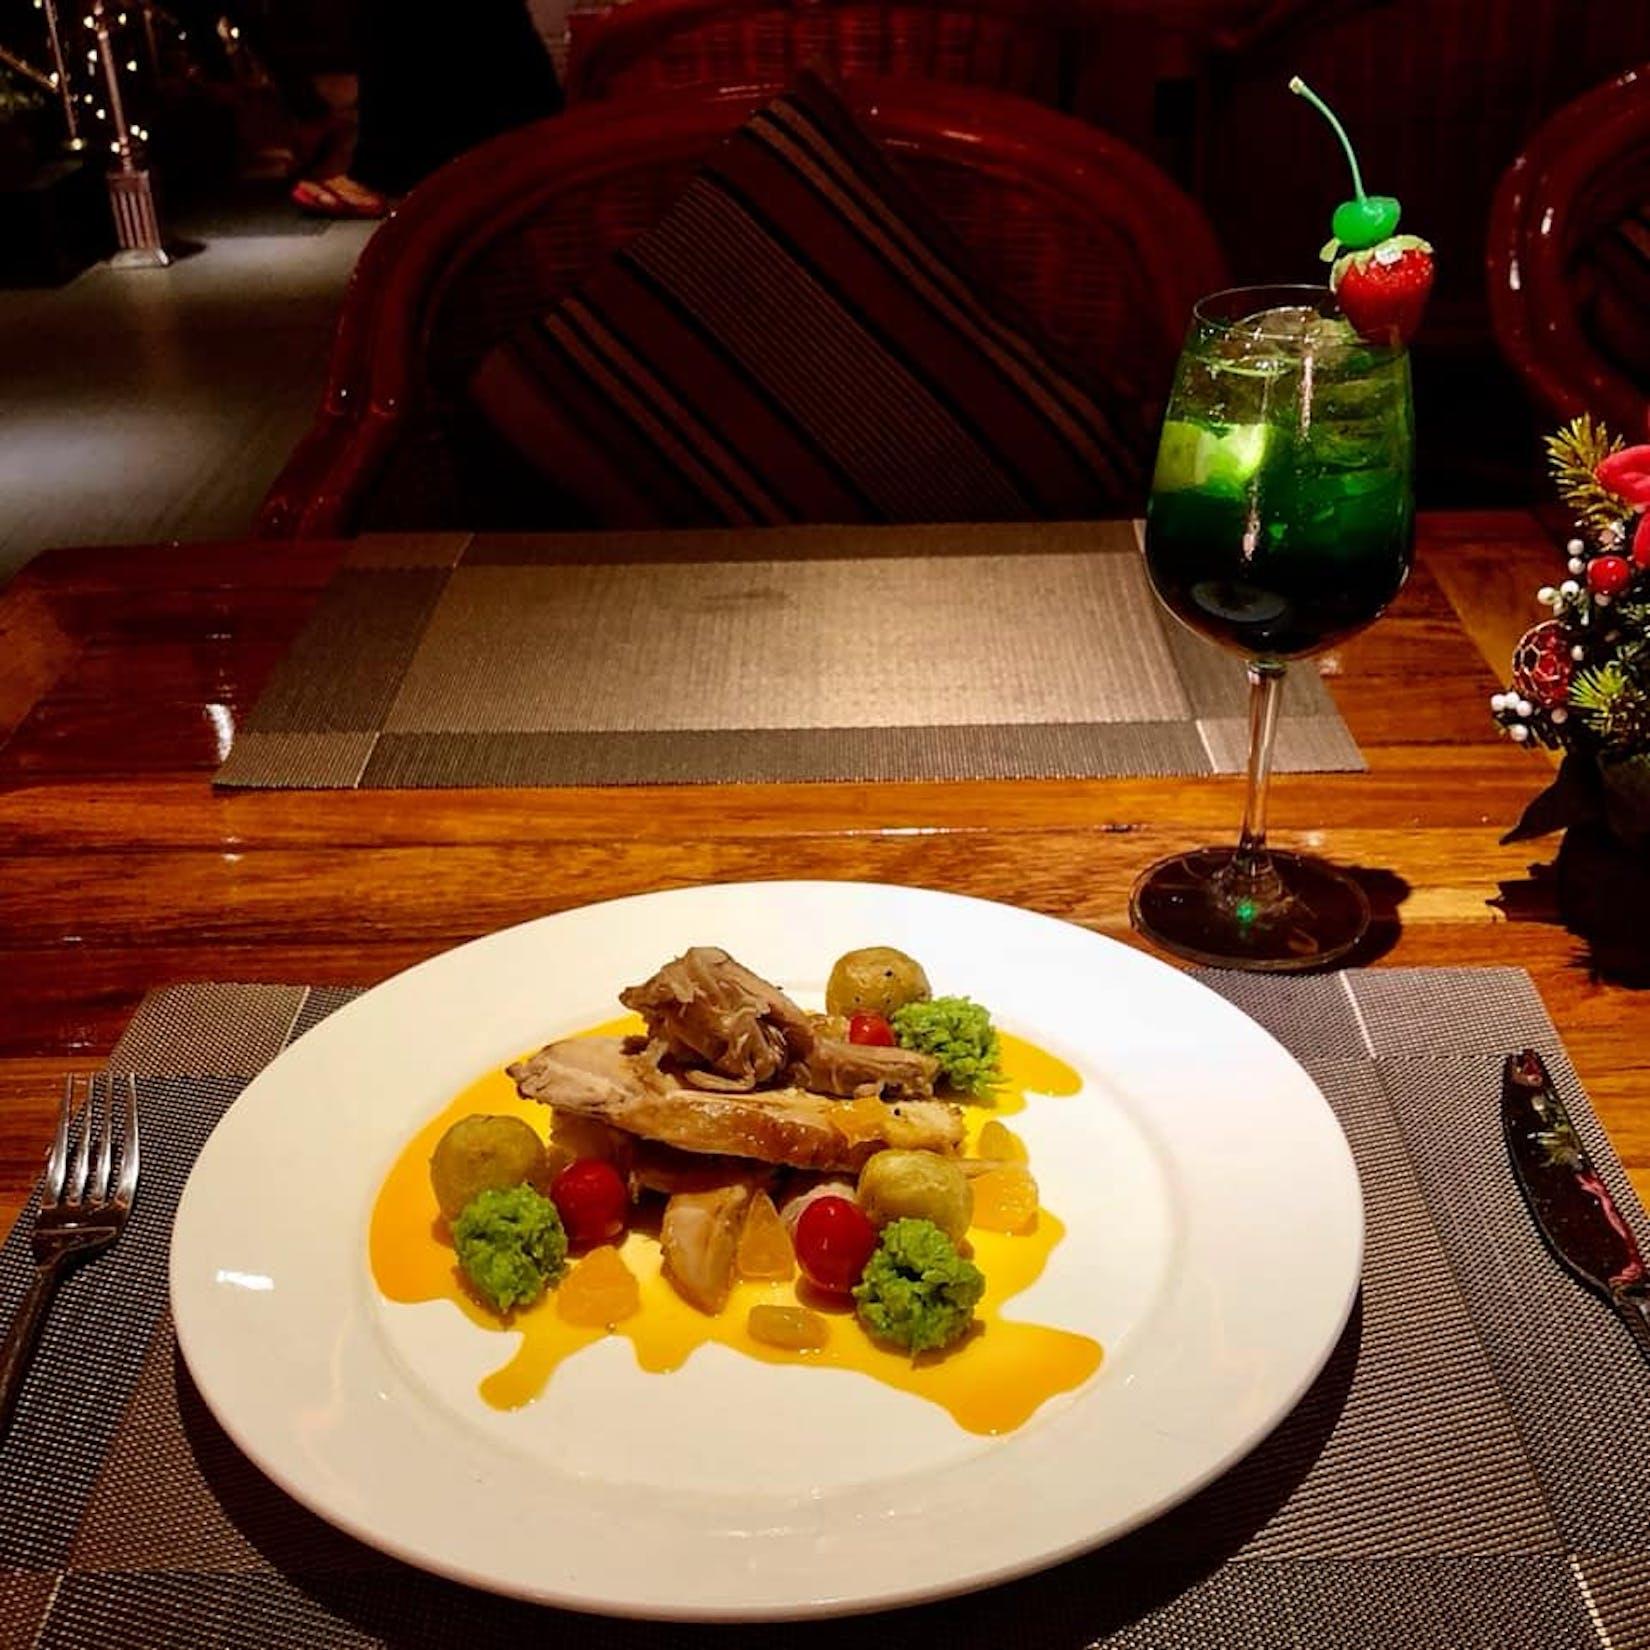 Station 36 Cafe & Restaurant | yathar